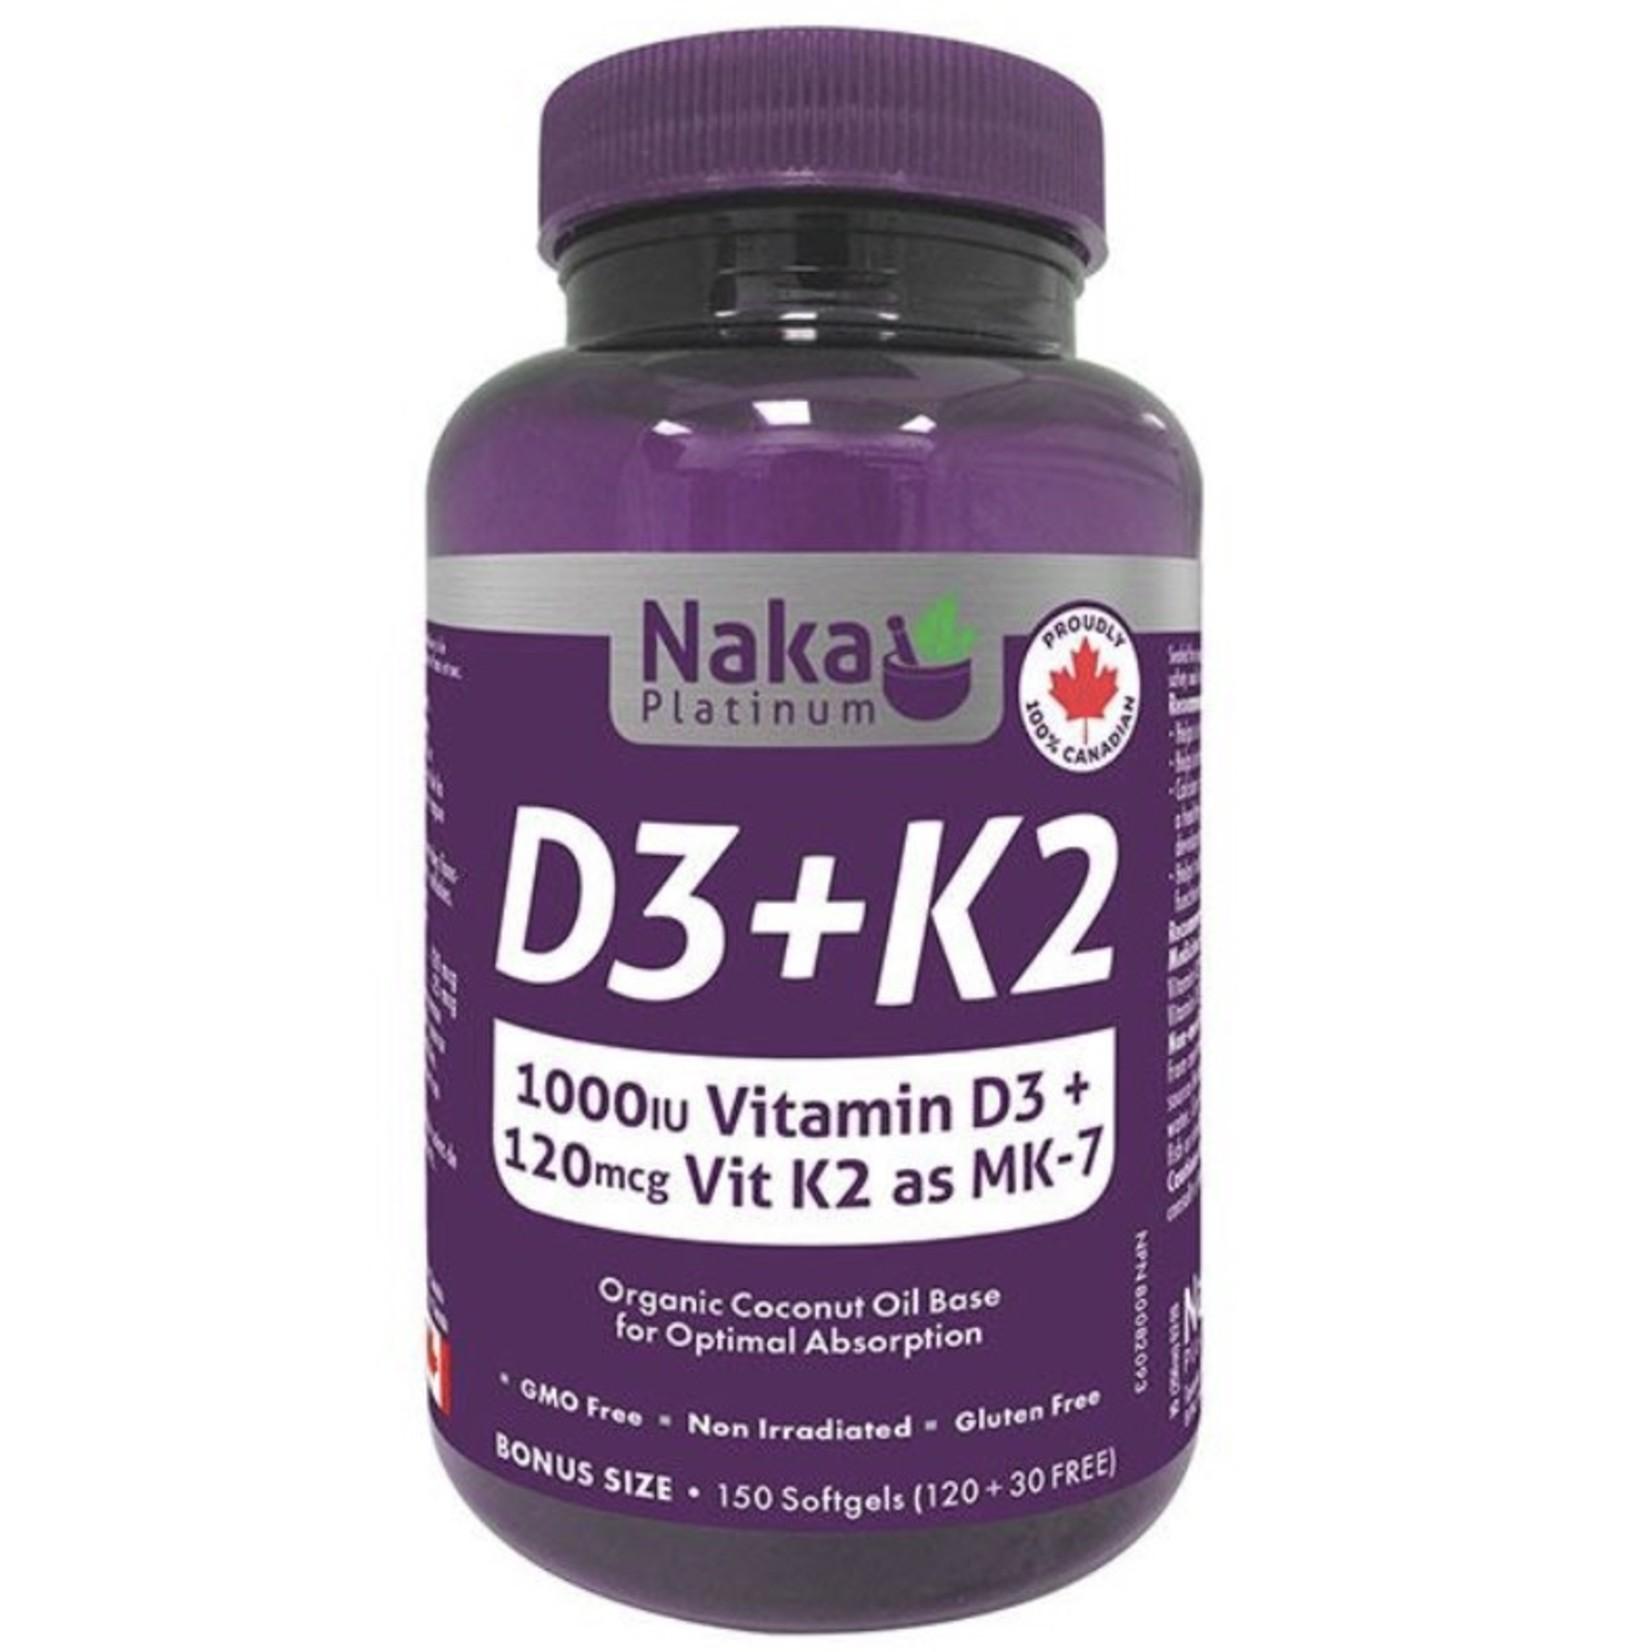 Naka Naka Vitamin D3+K2 150 softgels